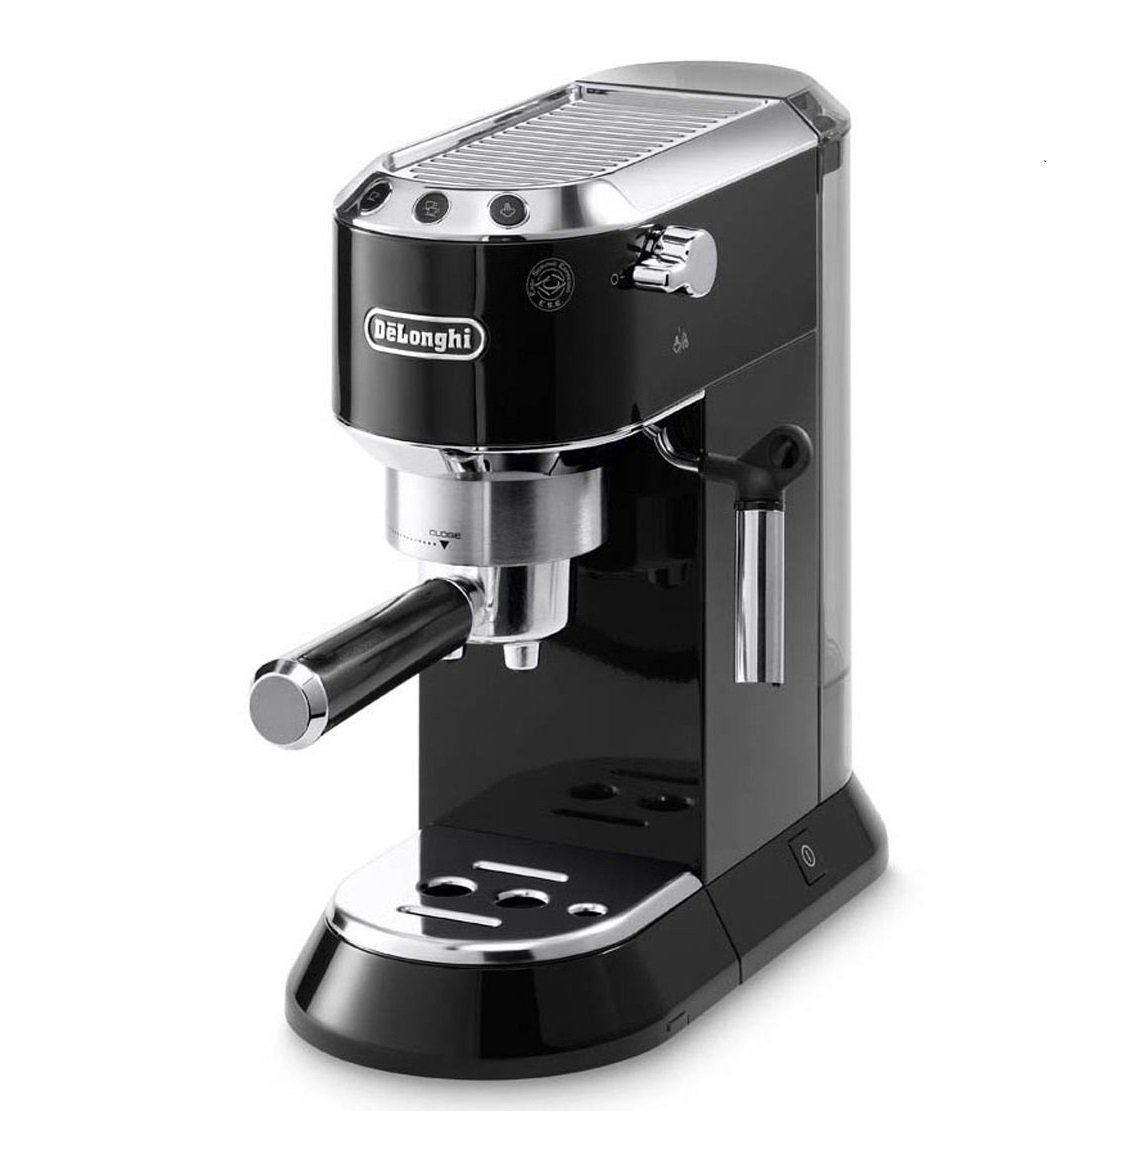 Máy pha cà phên EC680.BK